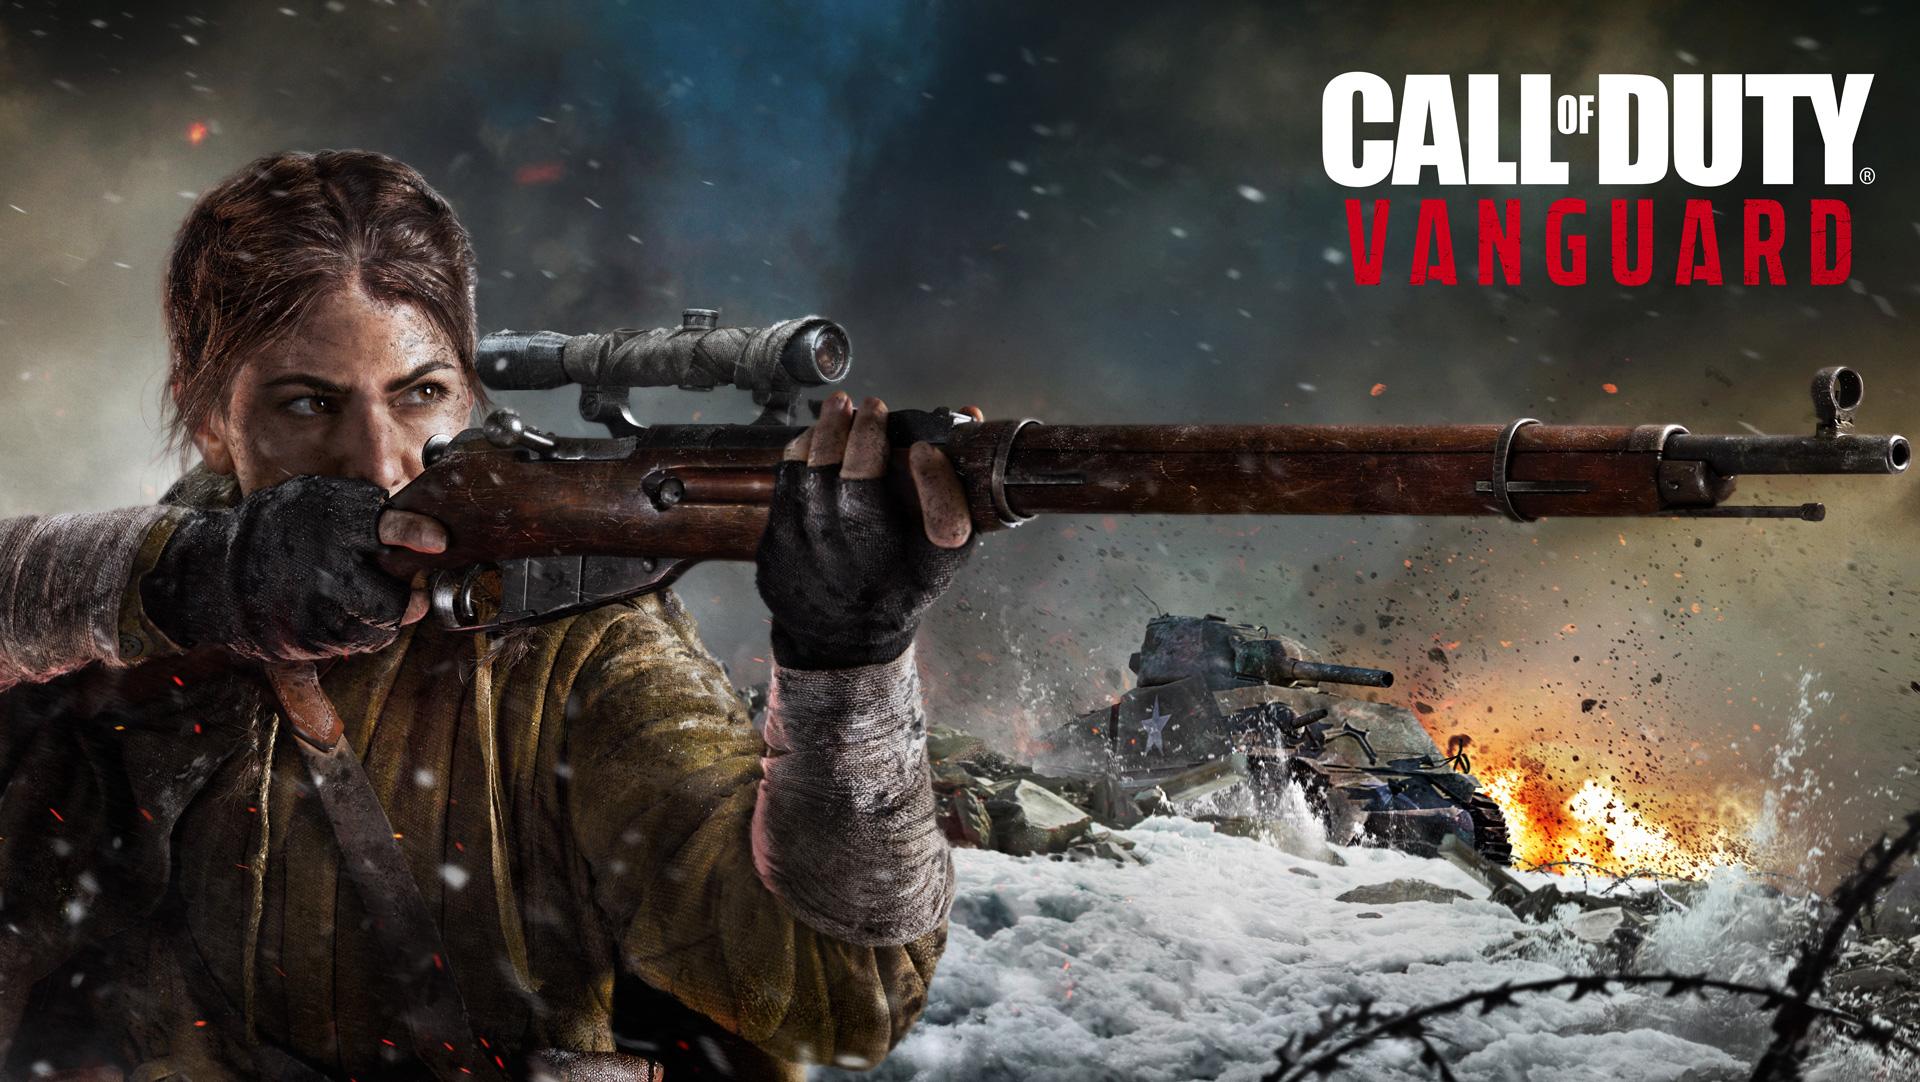 How to Play Call of Duty Vanguard Beta